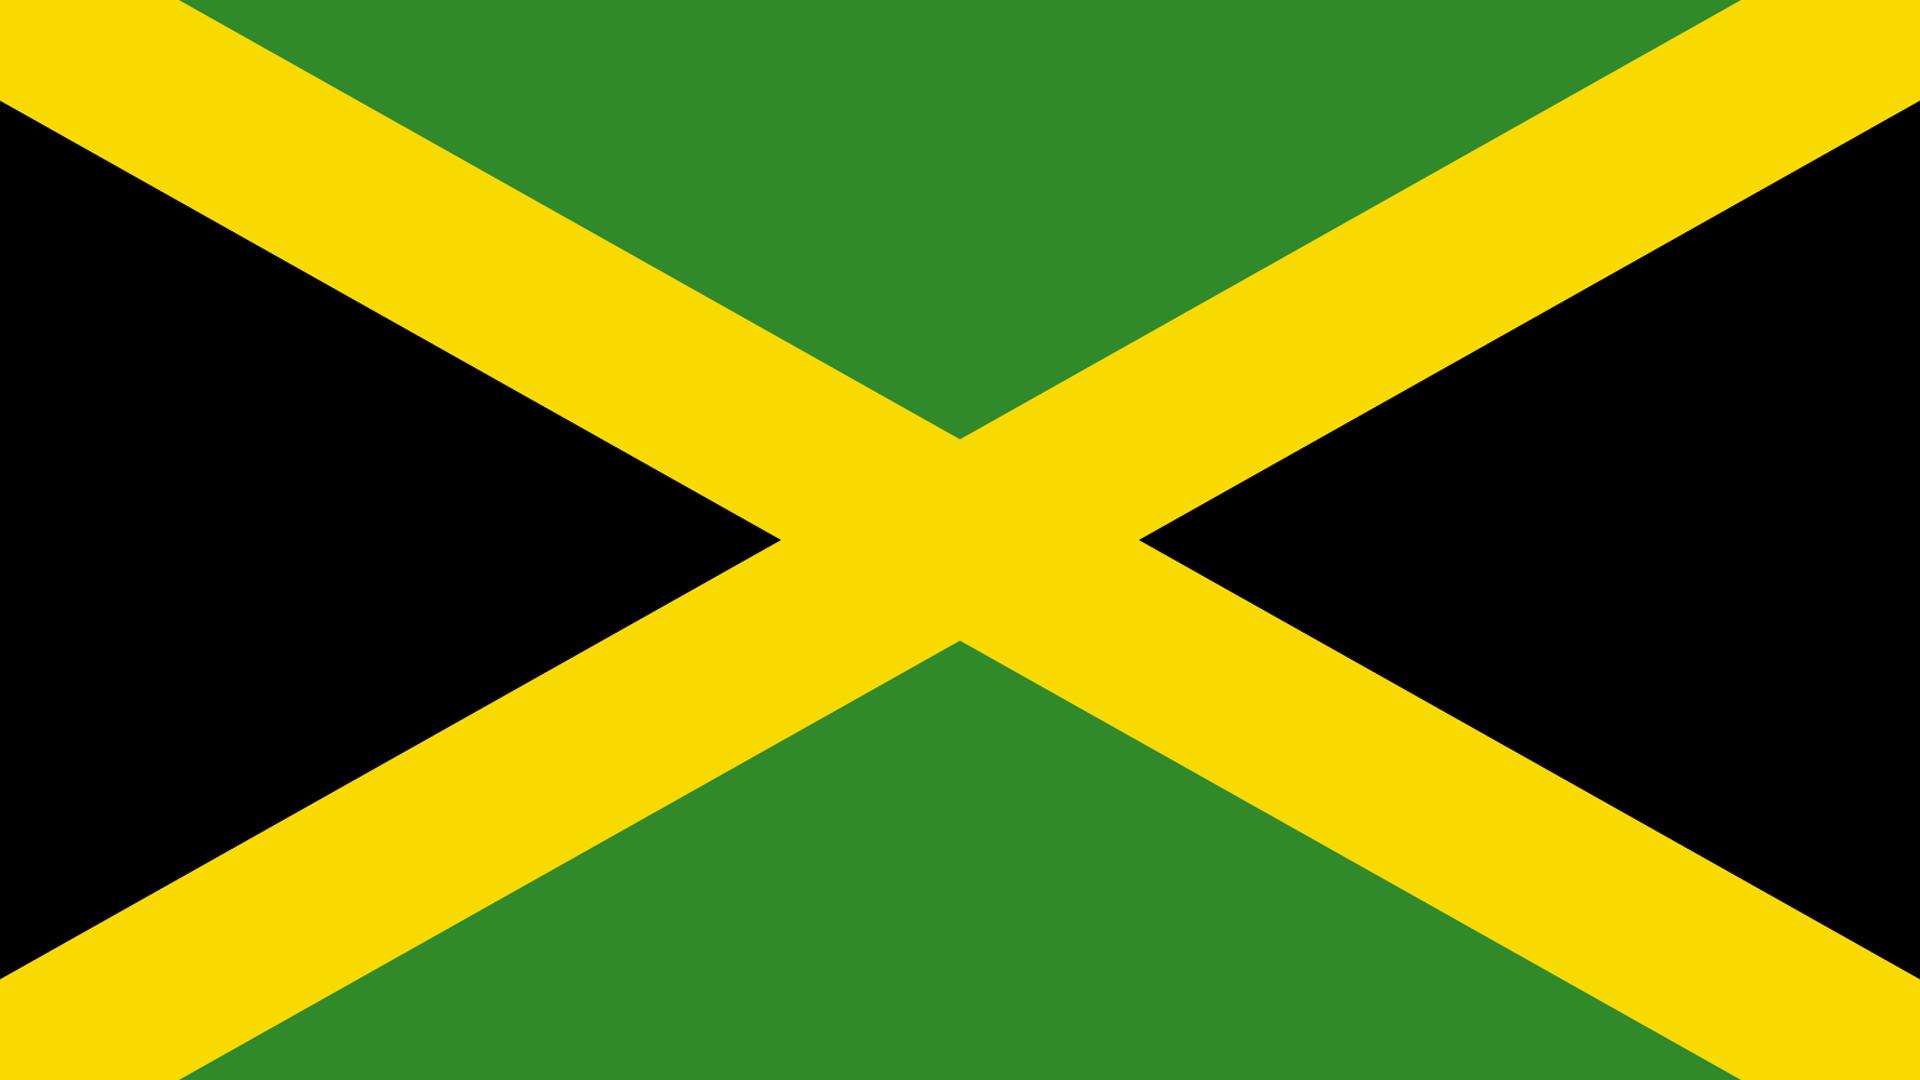 Filename: jamaica-flag_121318598.jpg